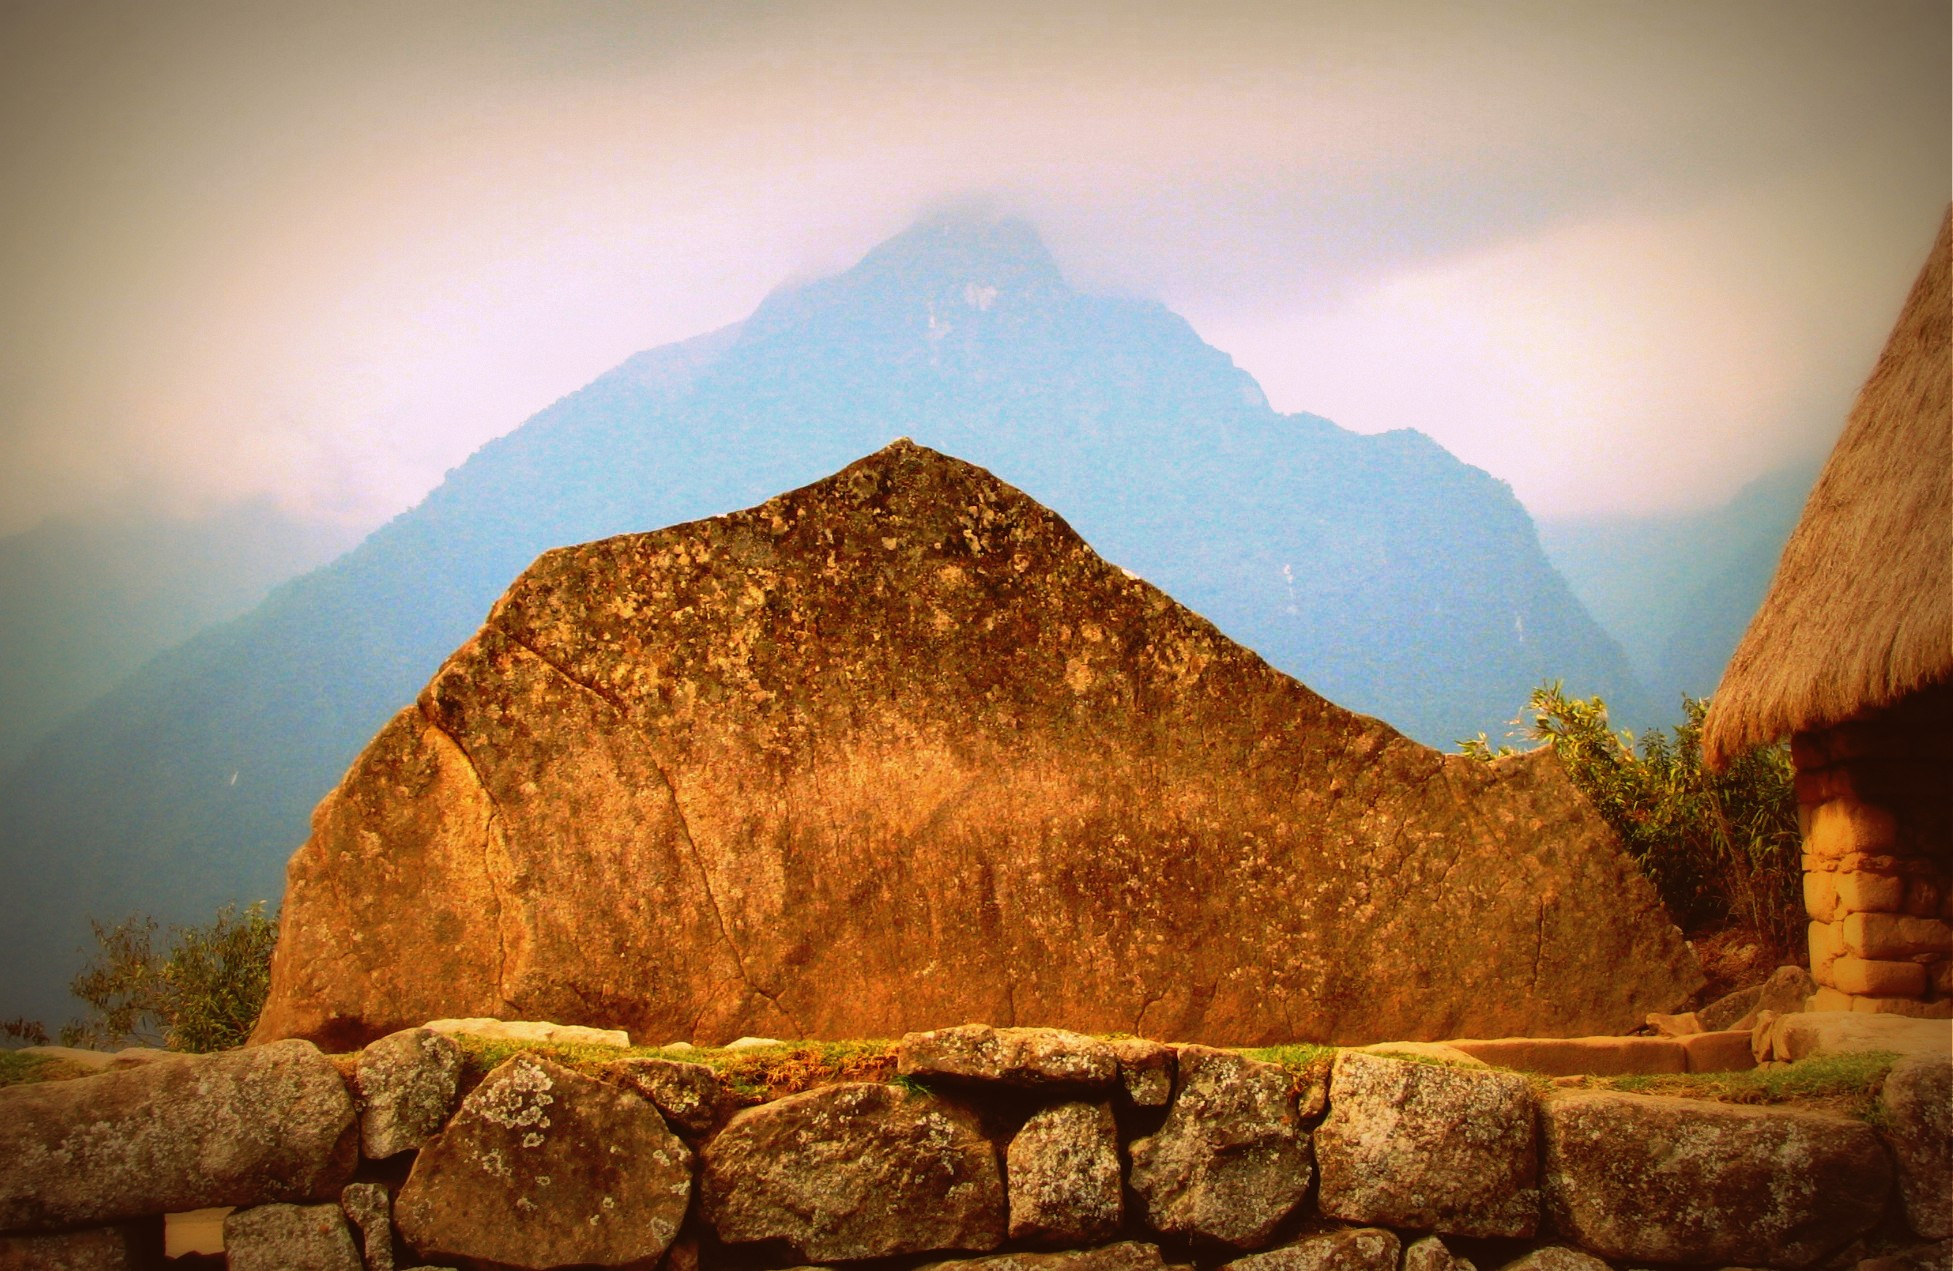 Rock cut like the Mountain behind